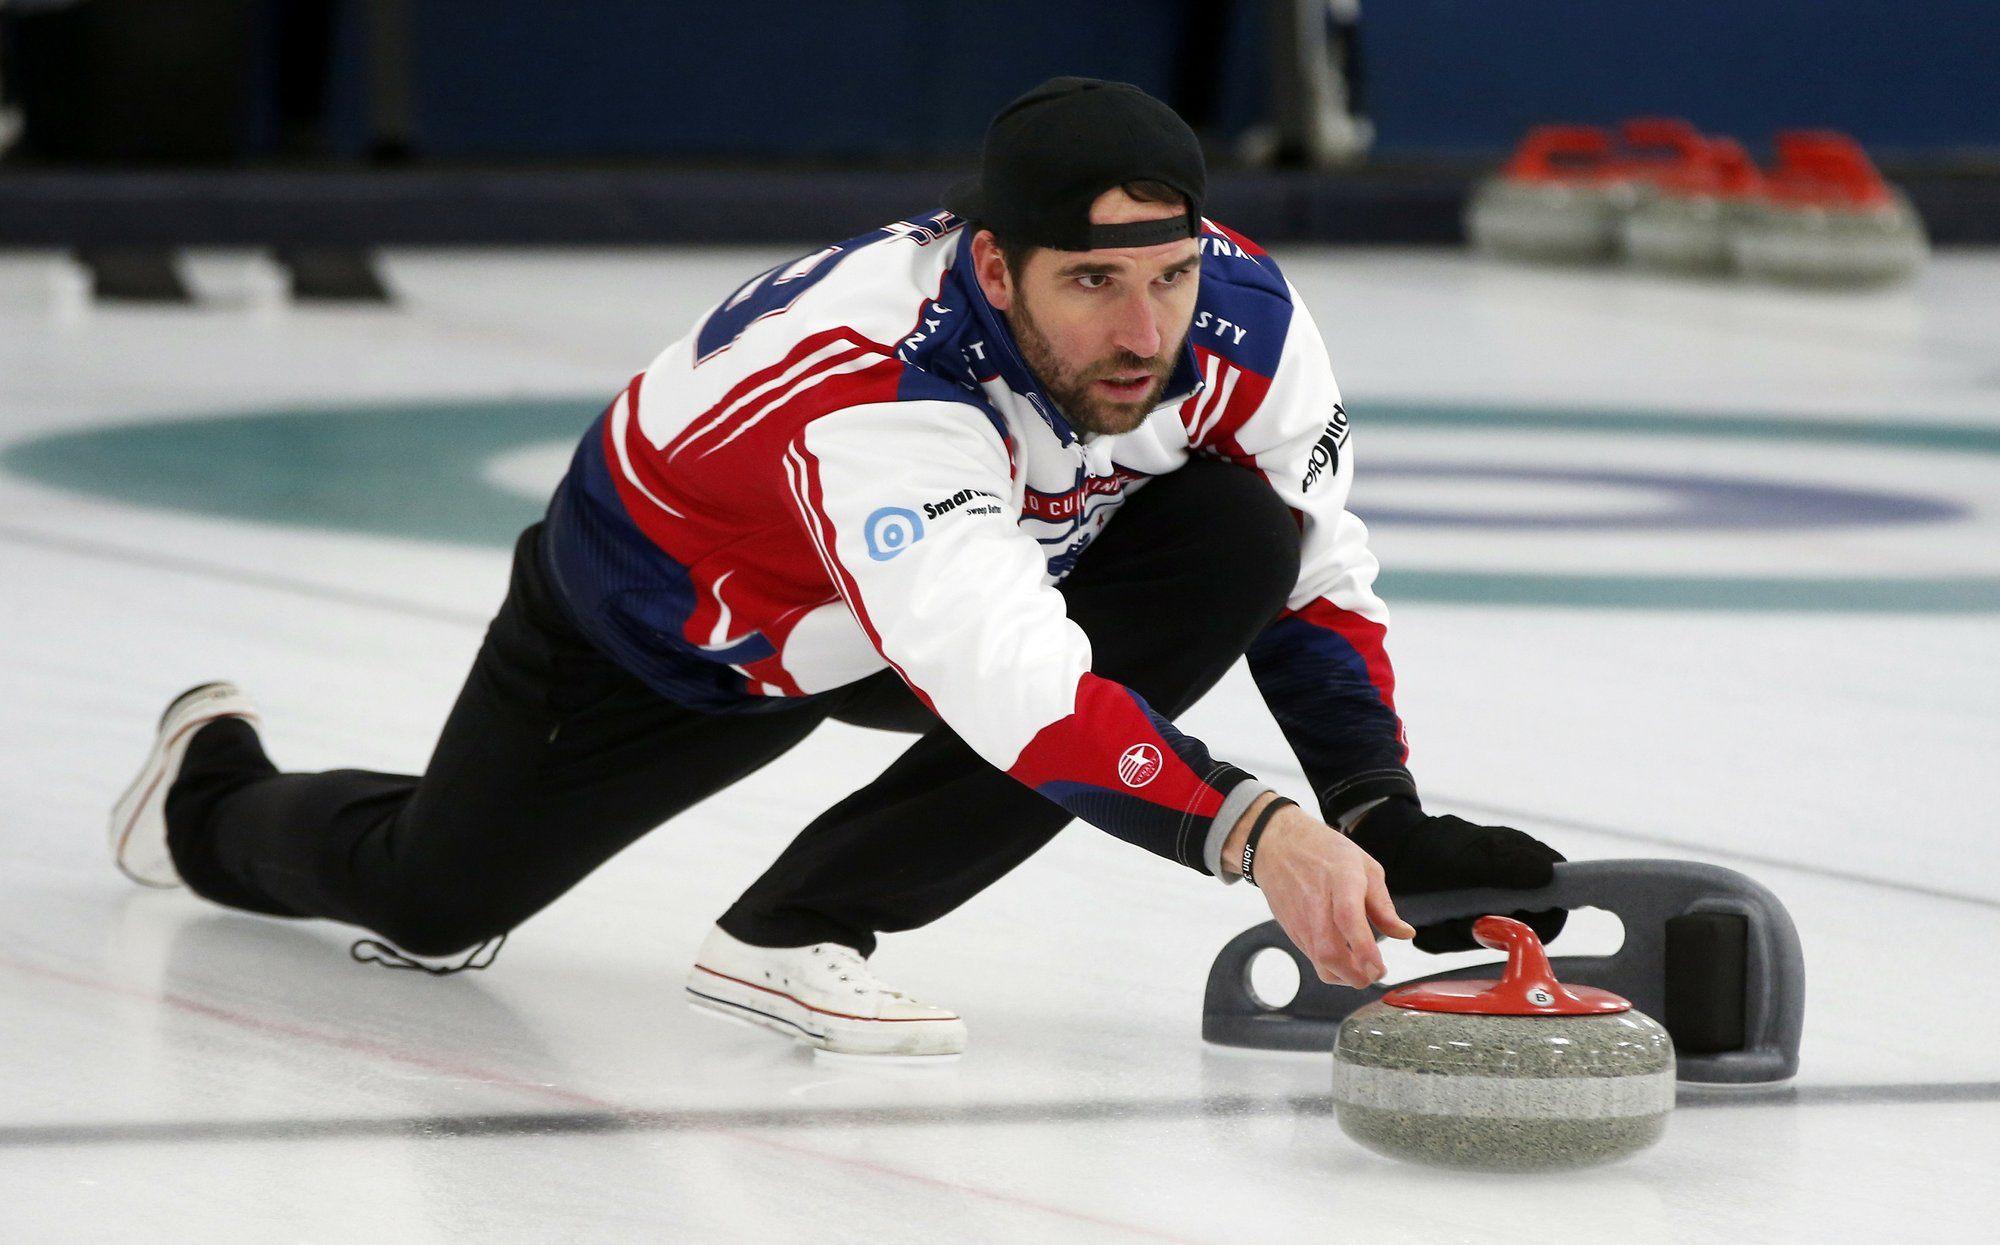 Jared Allen Olympics curling